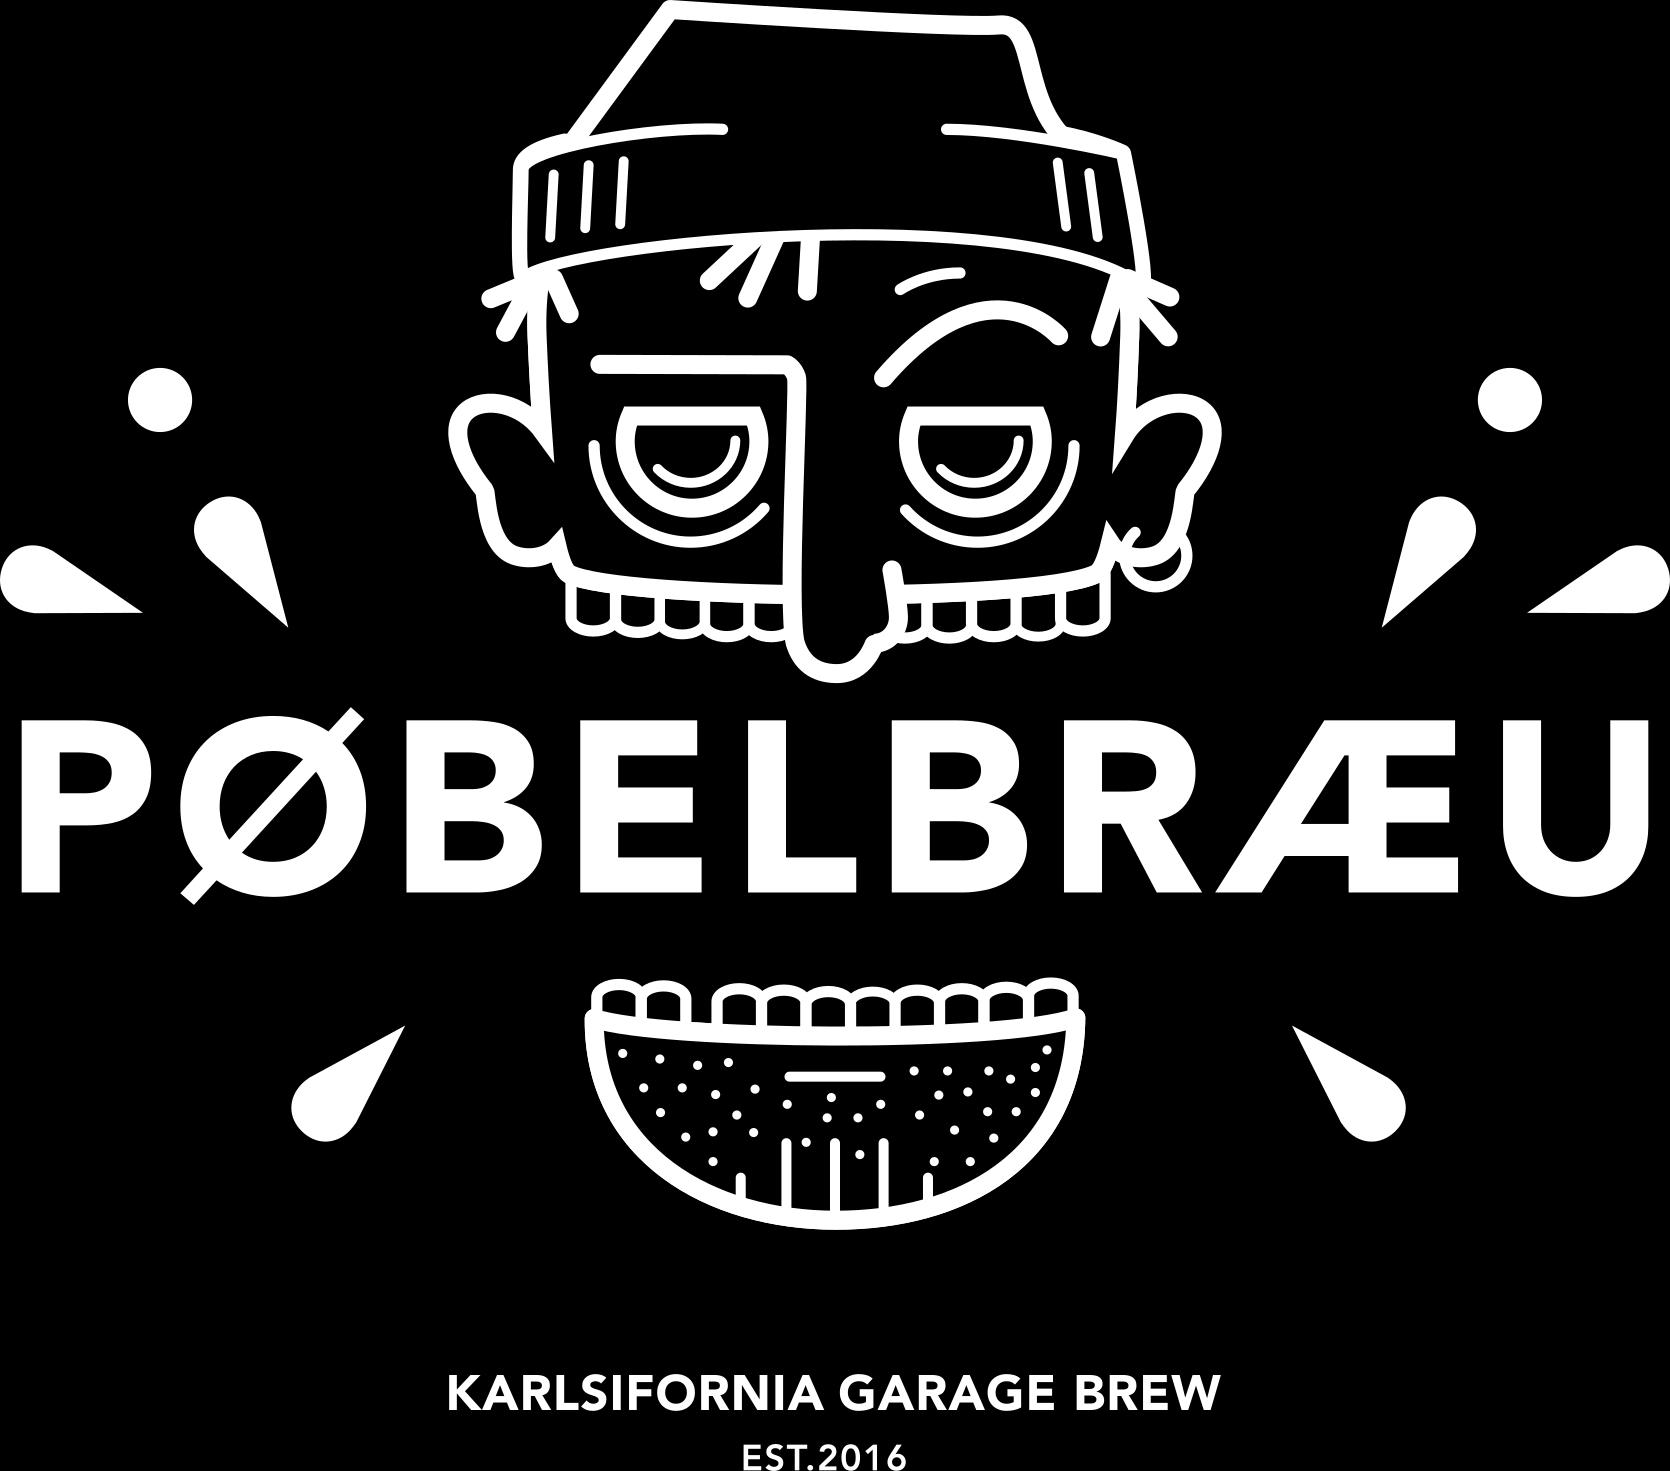 PØBELBRÆU | Karlsifornia Garage Brew